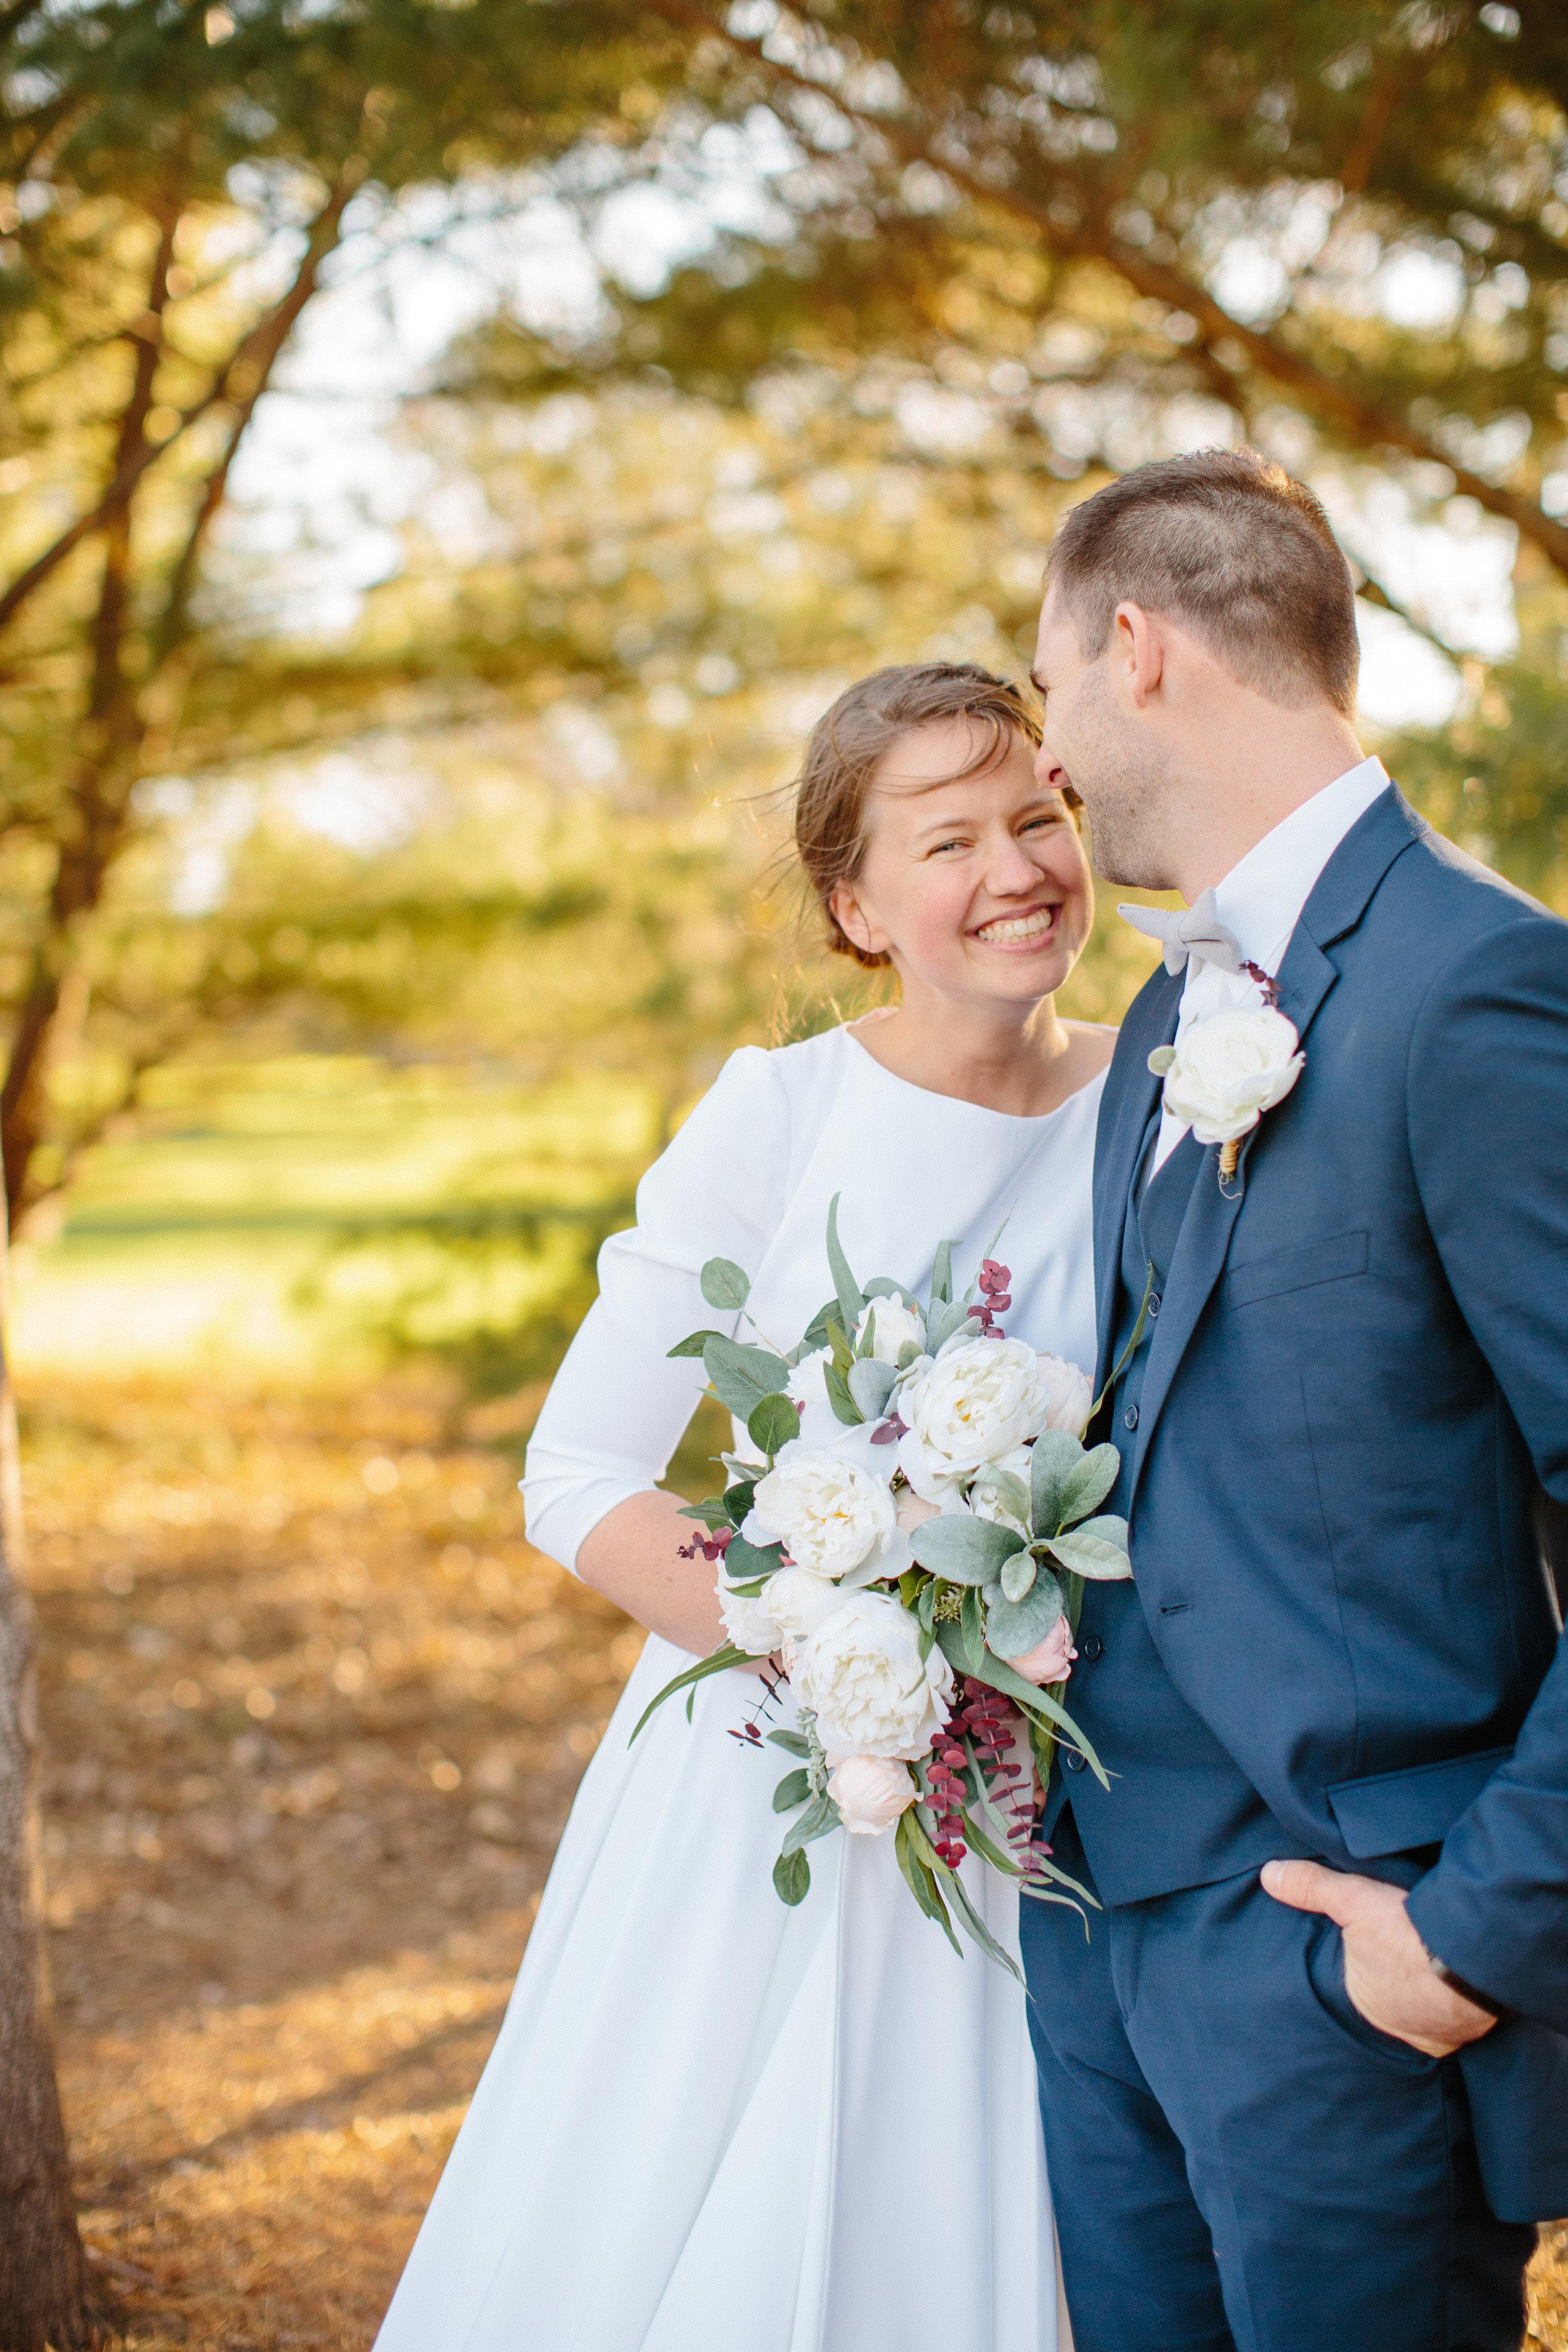 joyful happy romantic weddign photography Des Moines Iowa photography studios